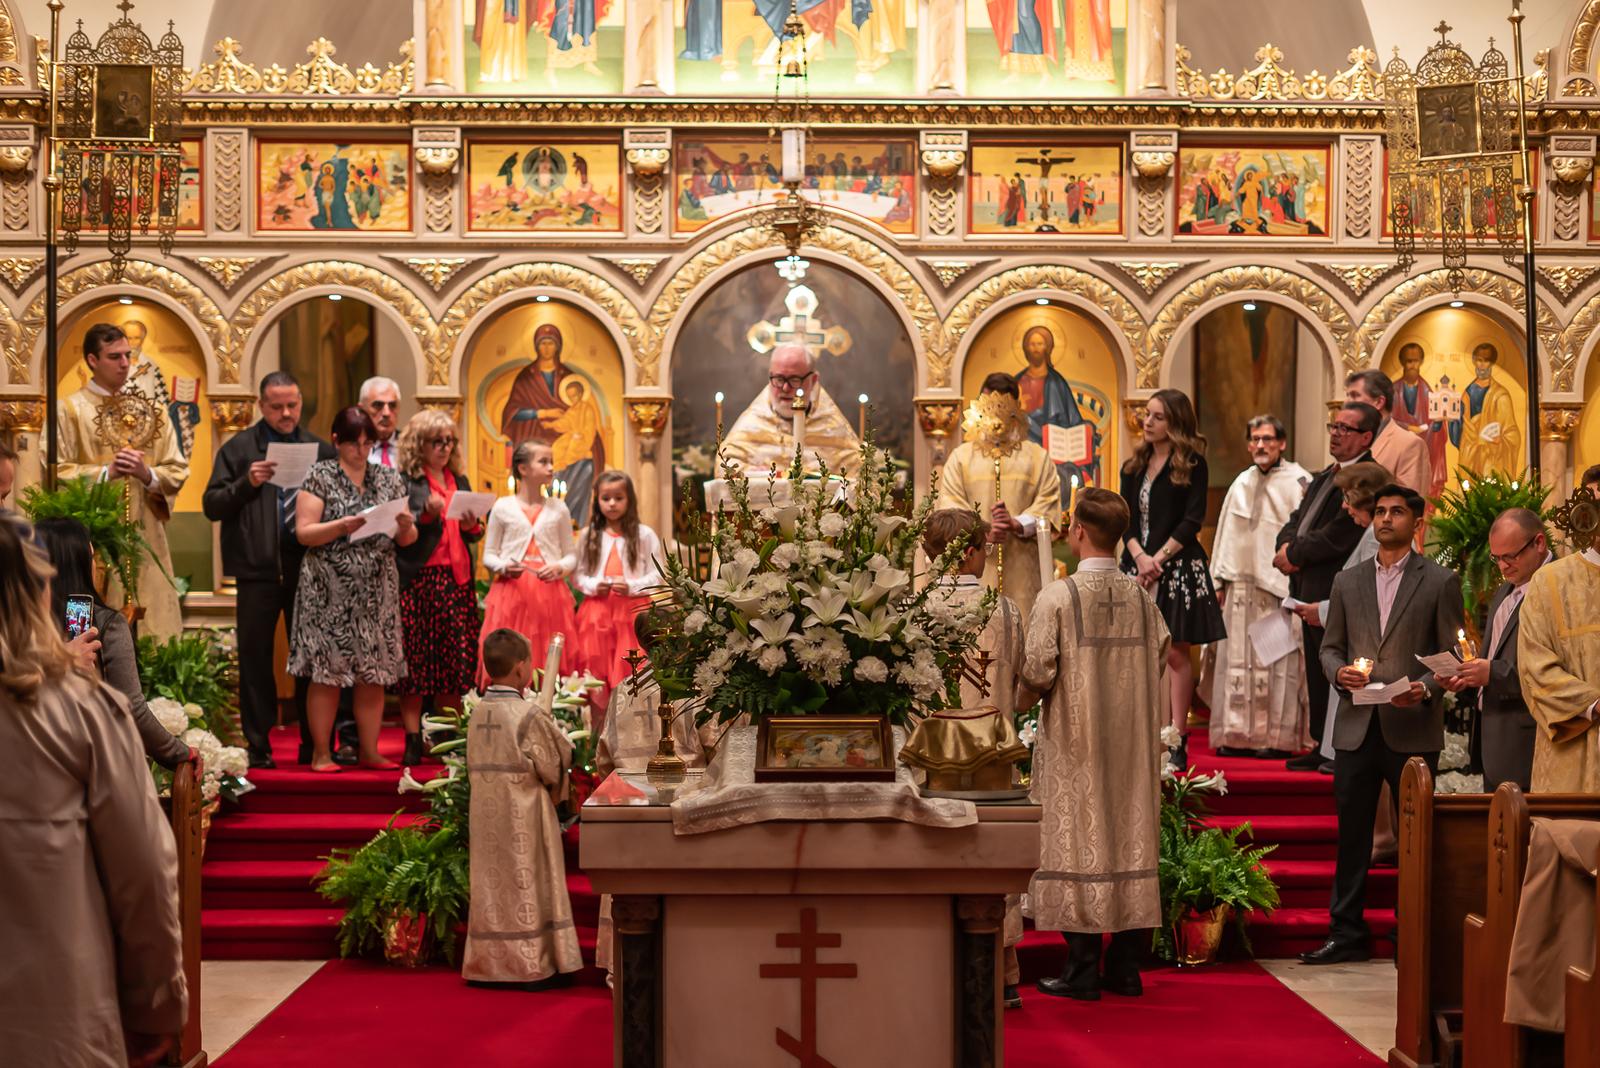 Saints Peter and Paul Orthodox Church - Home